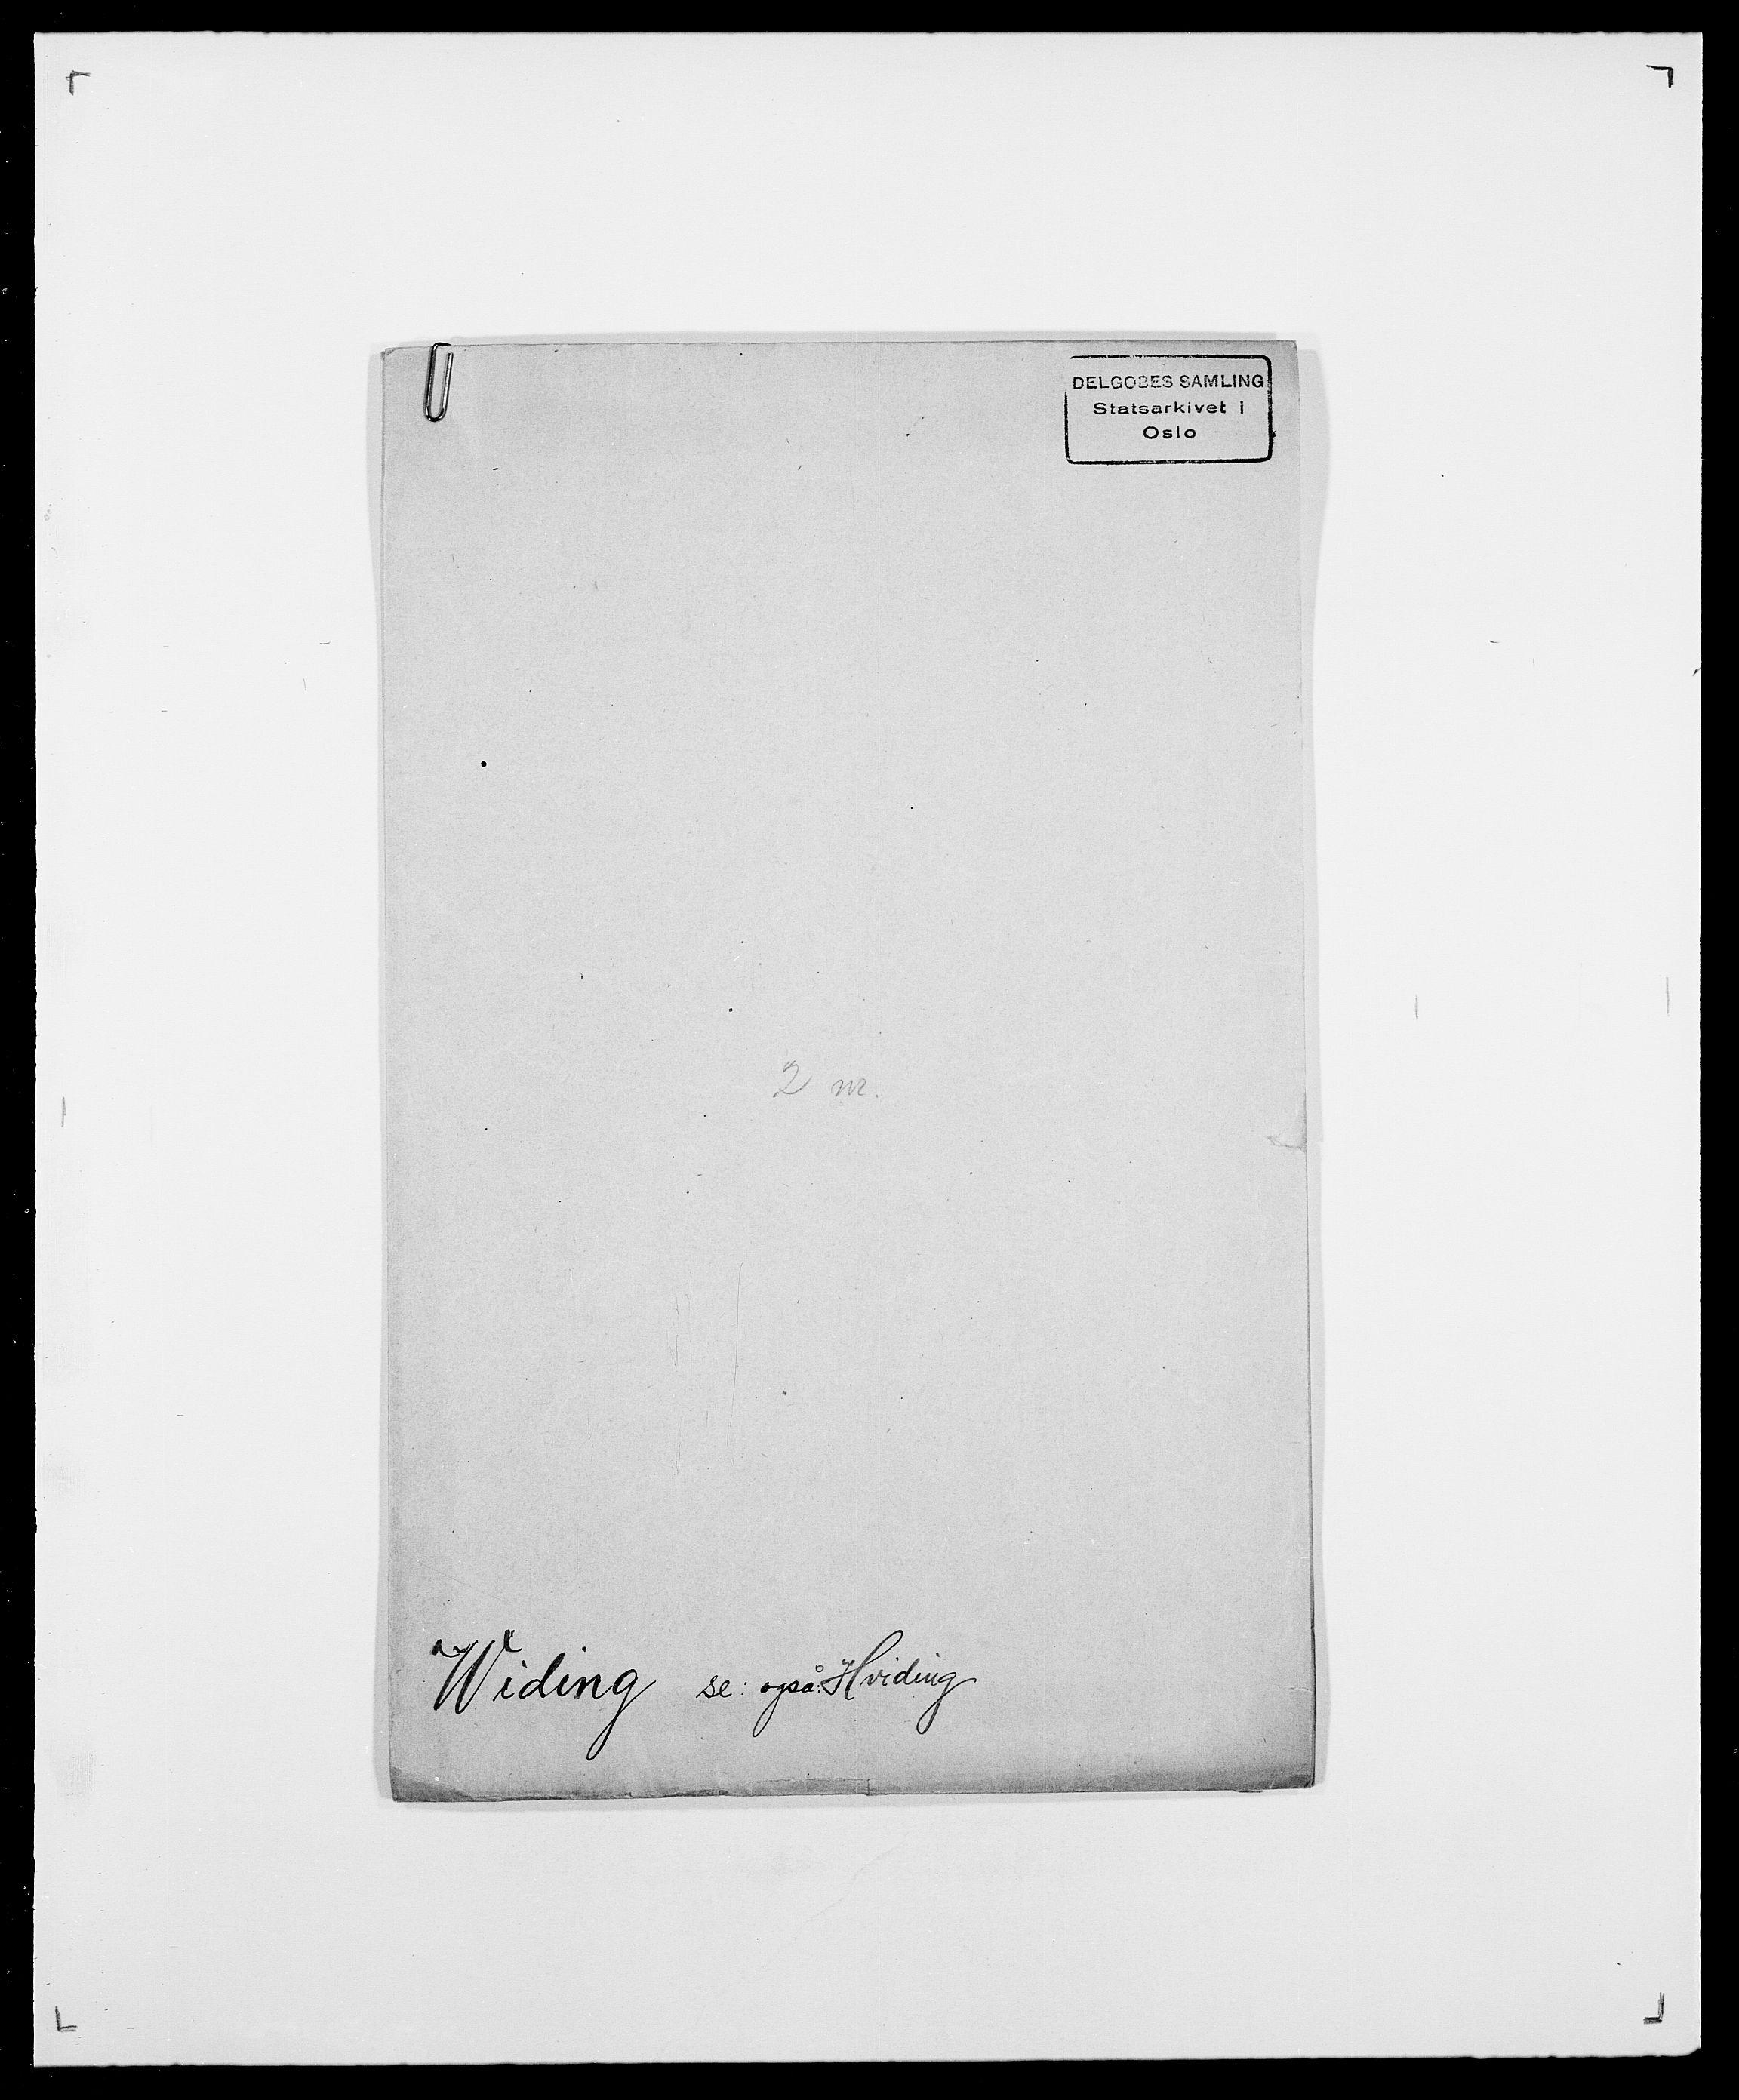 SAO, Delgobe, Charles Antoine - samling, D/Da/L0041: Vemmestad - Viker, s. 467